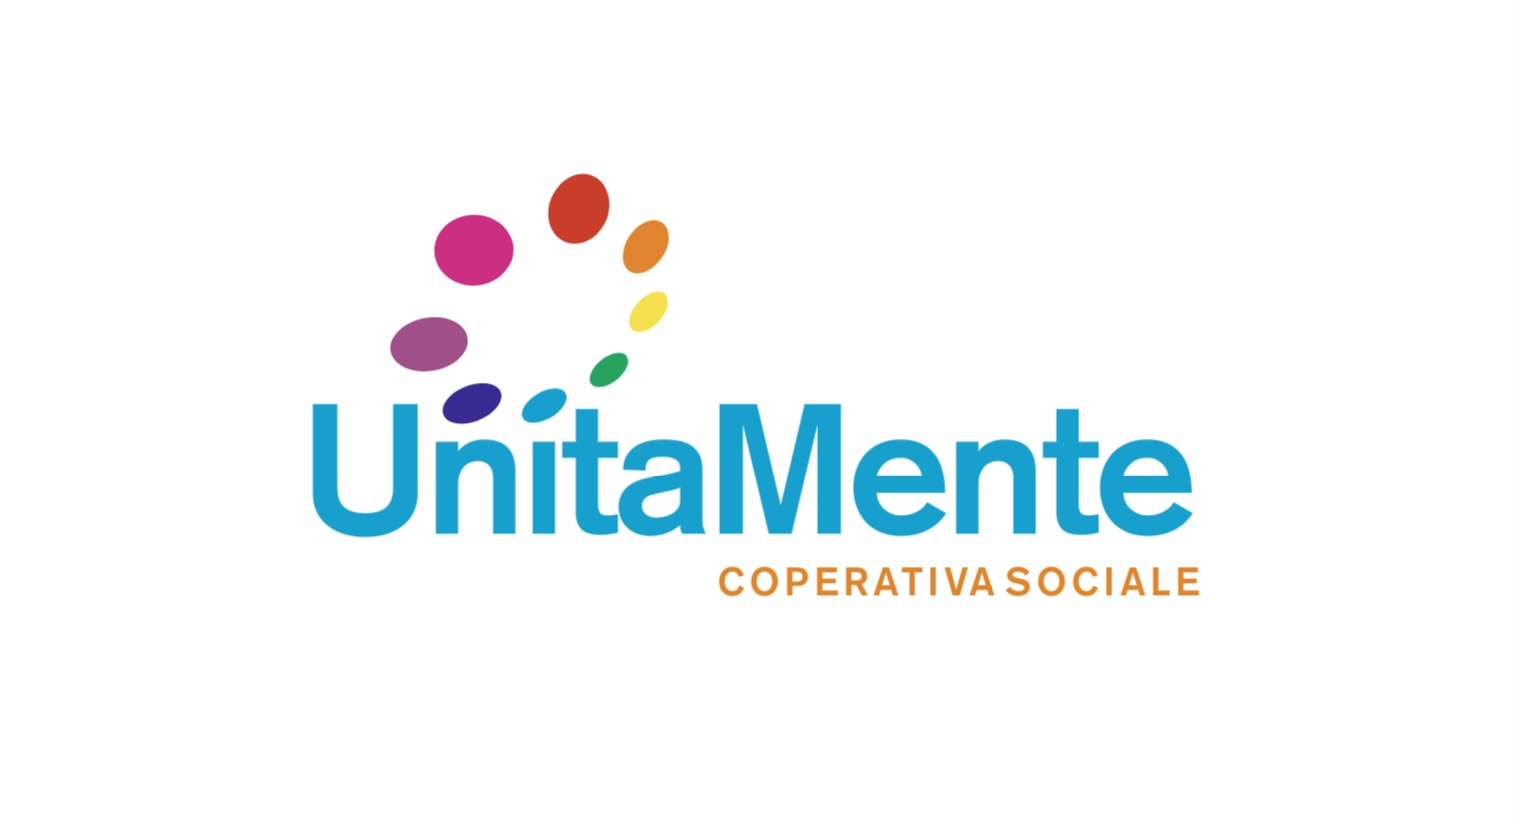 UnitaMente